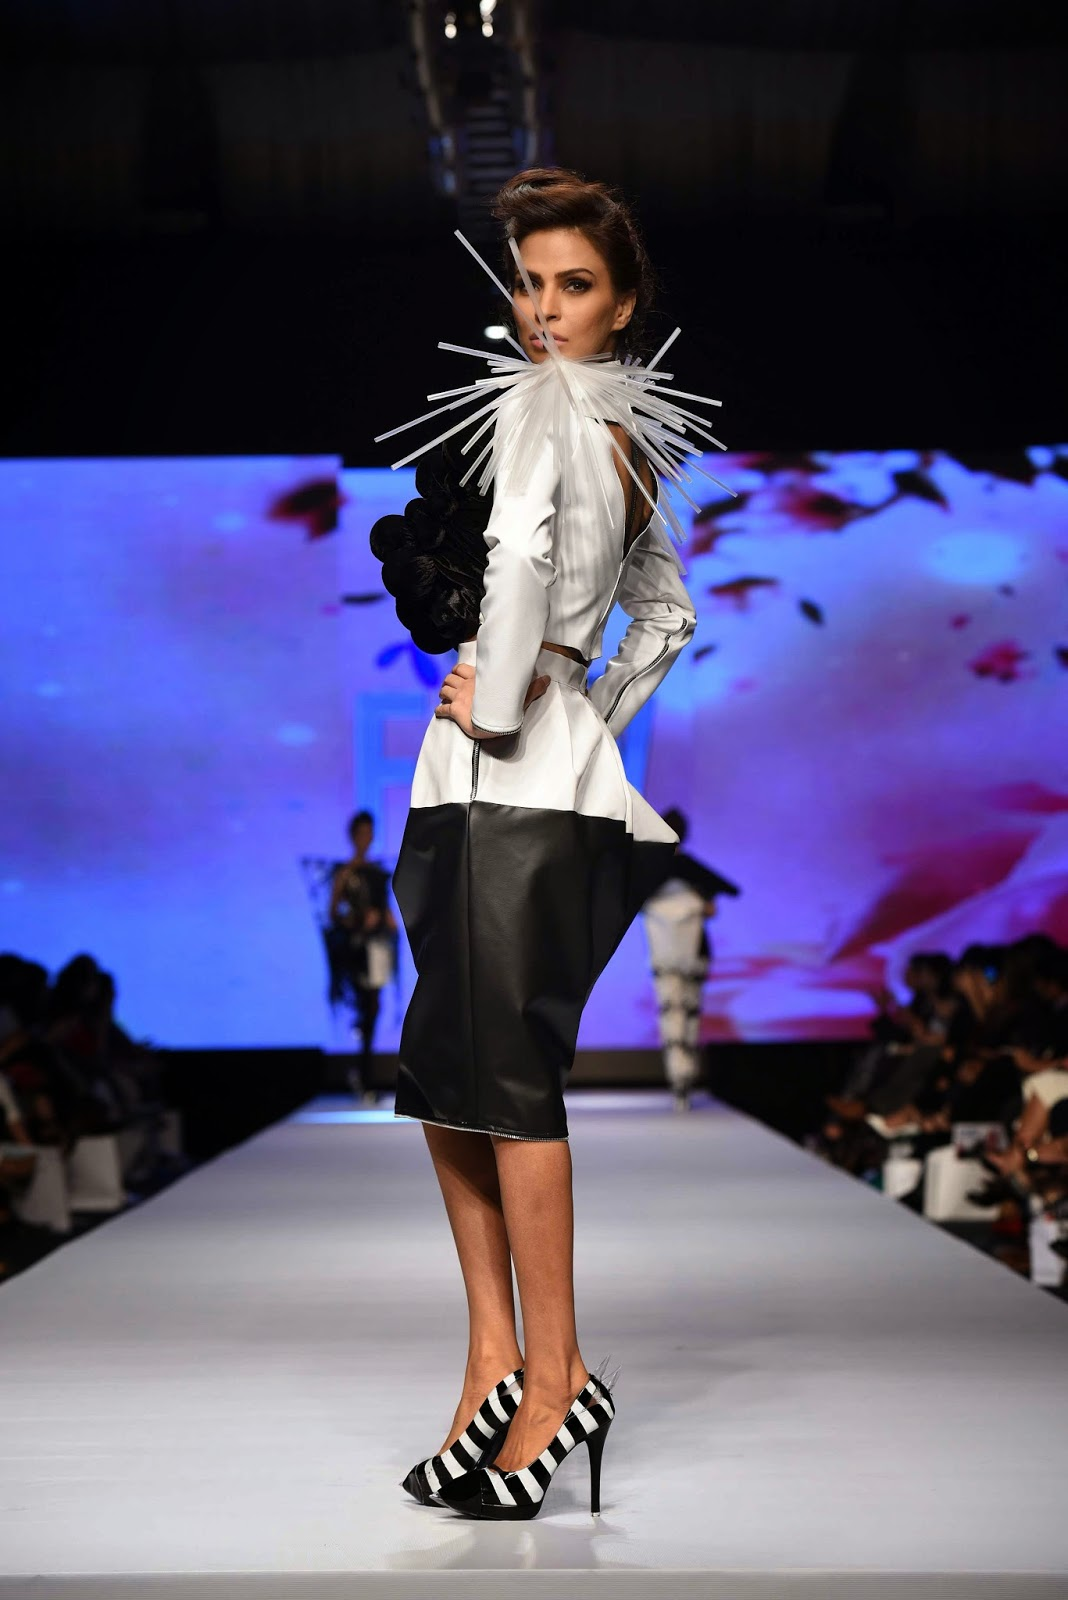 Rimsha Shakir Telenor Fashion Pakistan Week 2015 Day 1